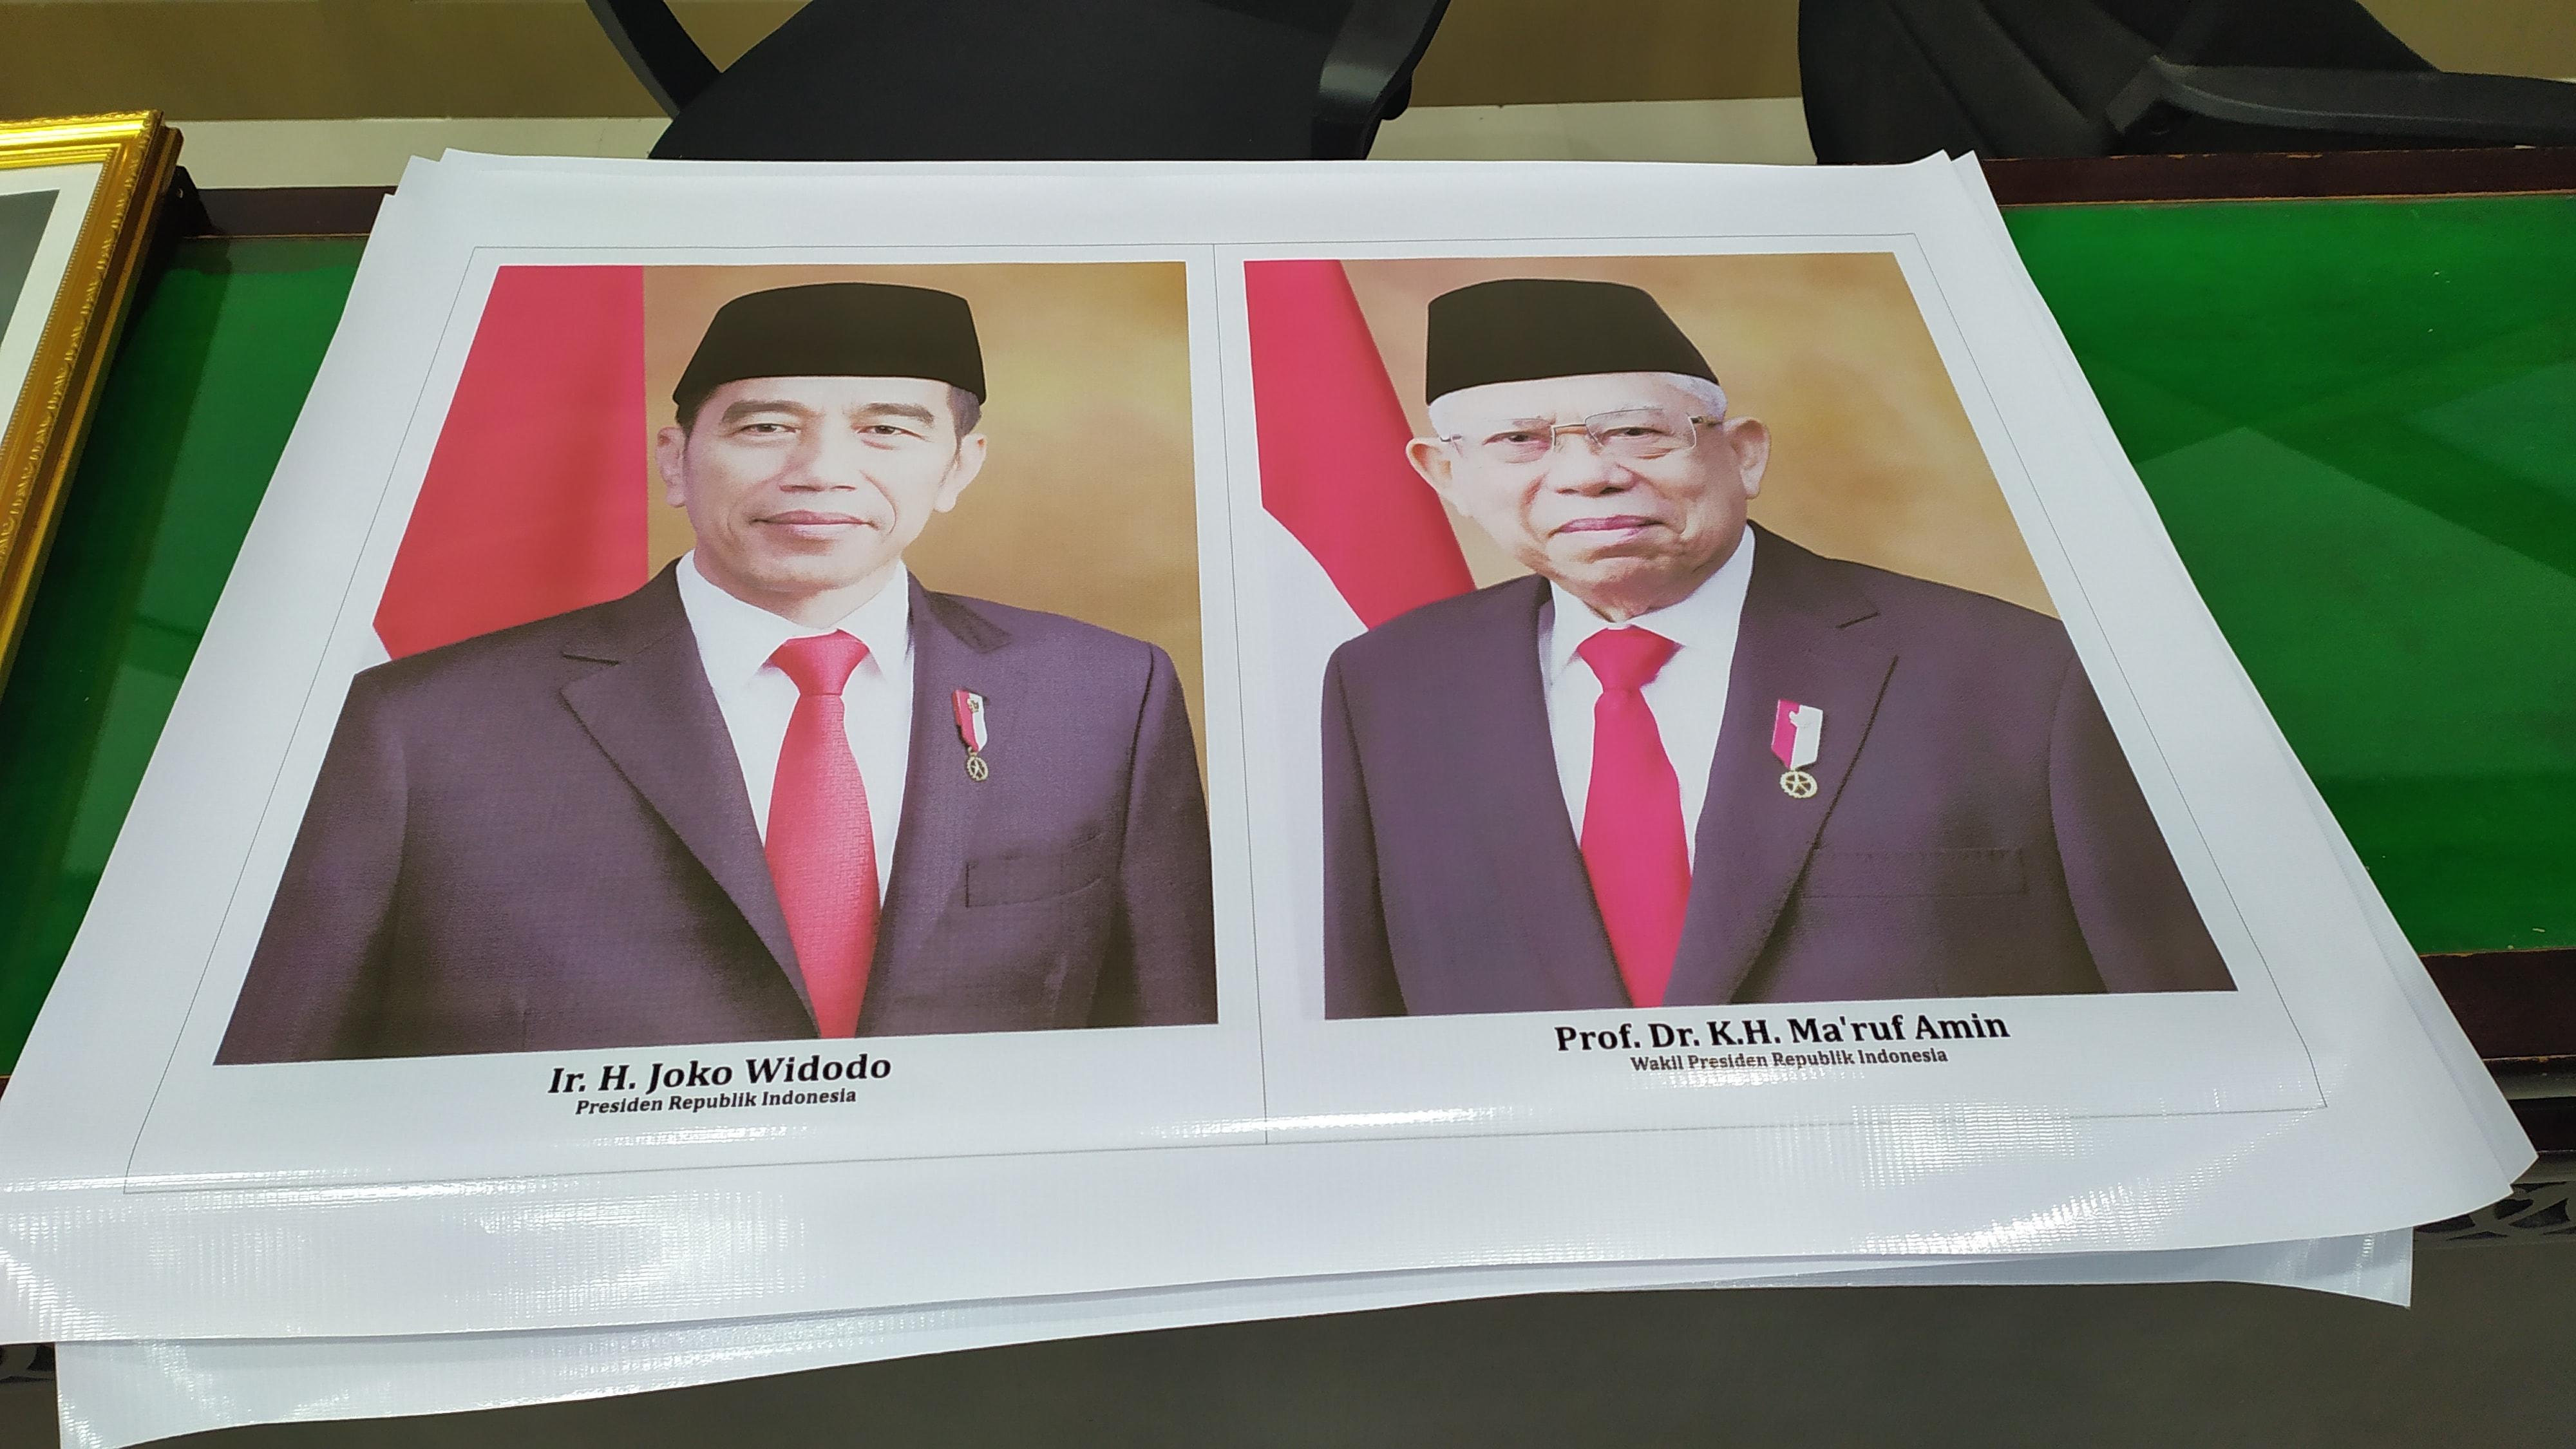 Cerita Dpr Aceh Cetak Foto Presiden 2019 Di Spanduk Printqoe